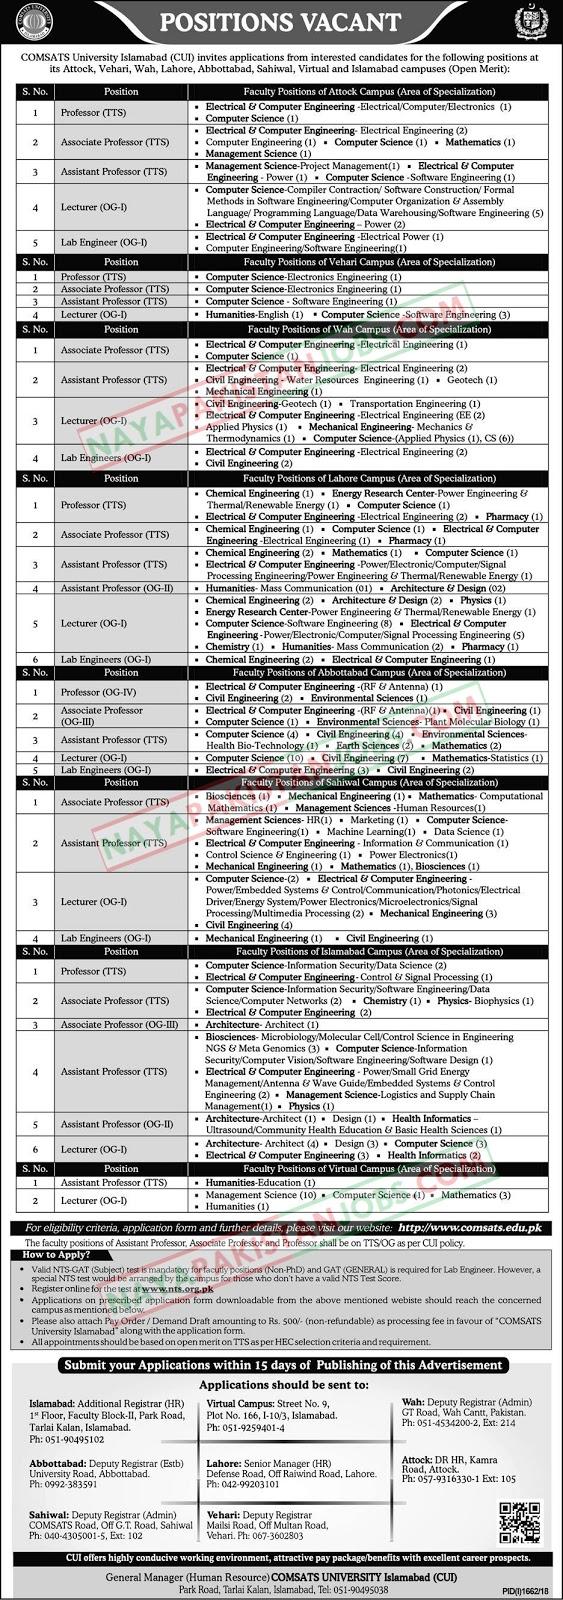 Latest Vacancies Announced in COMSATS University Islamabad Online Registration 14 October 2018 - Naya Pakistan